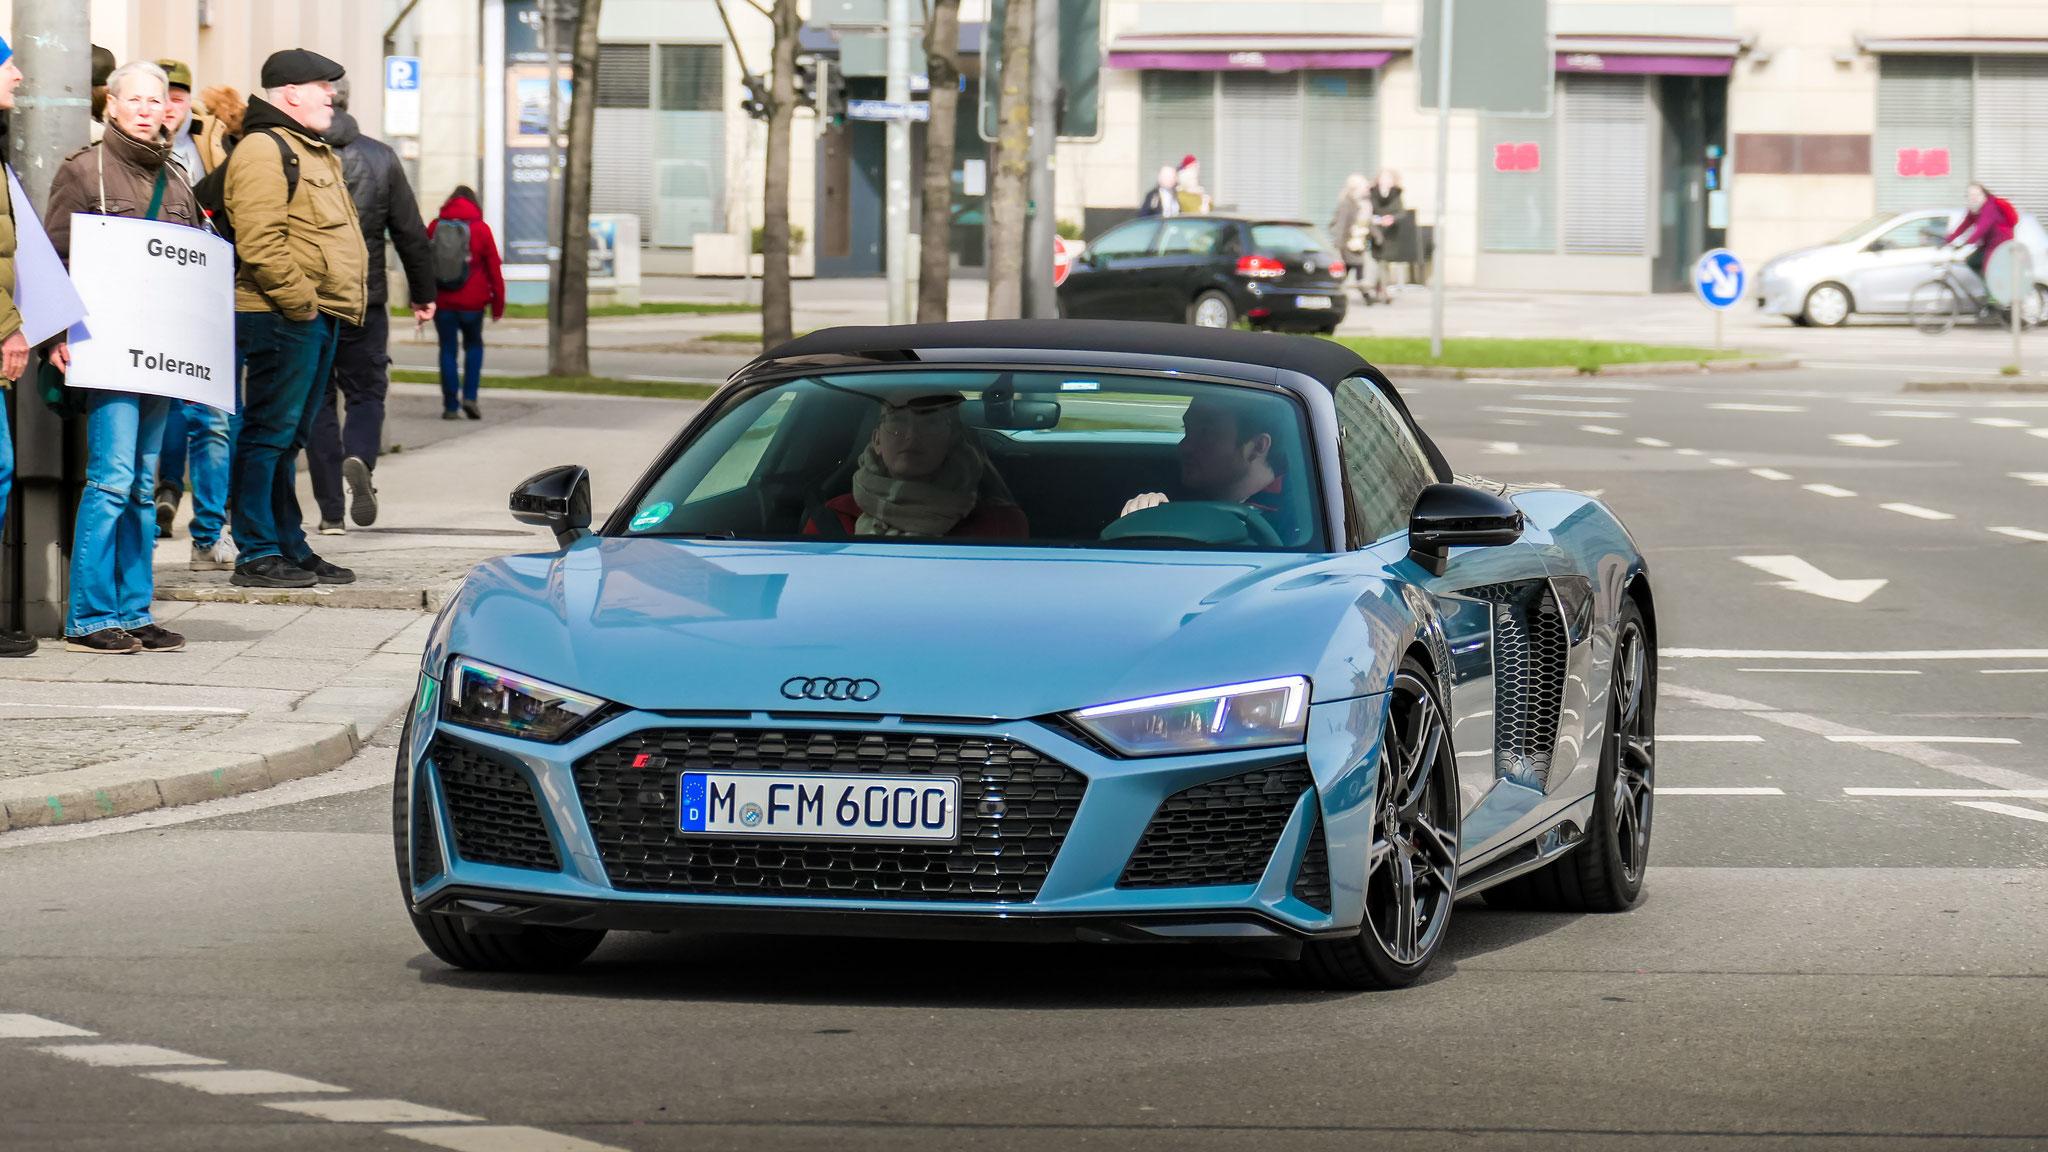 Audi R8 V10 Spyder - M-FM-6000